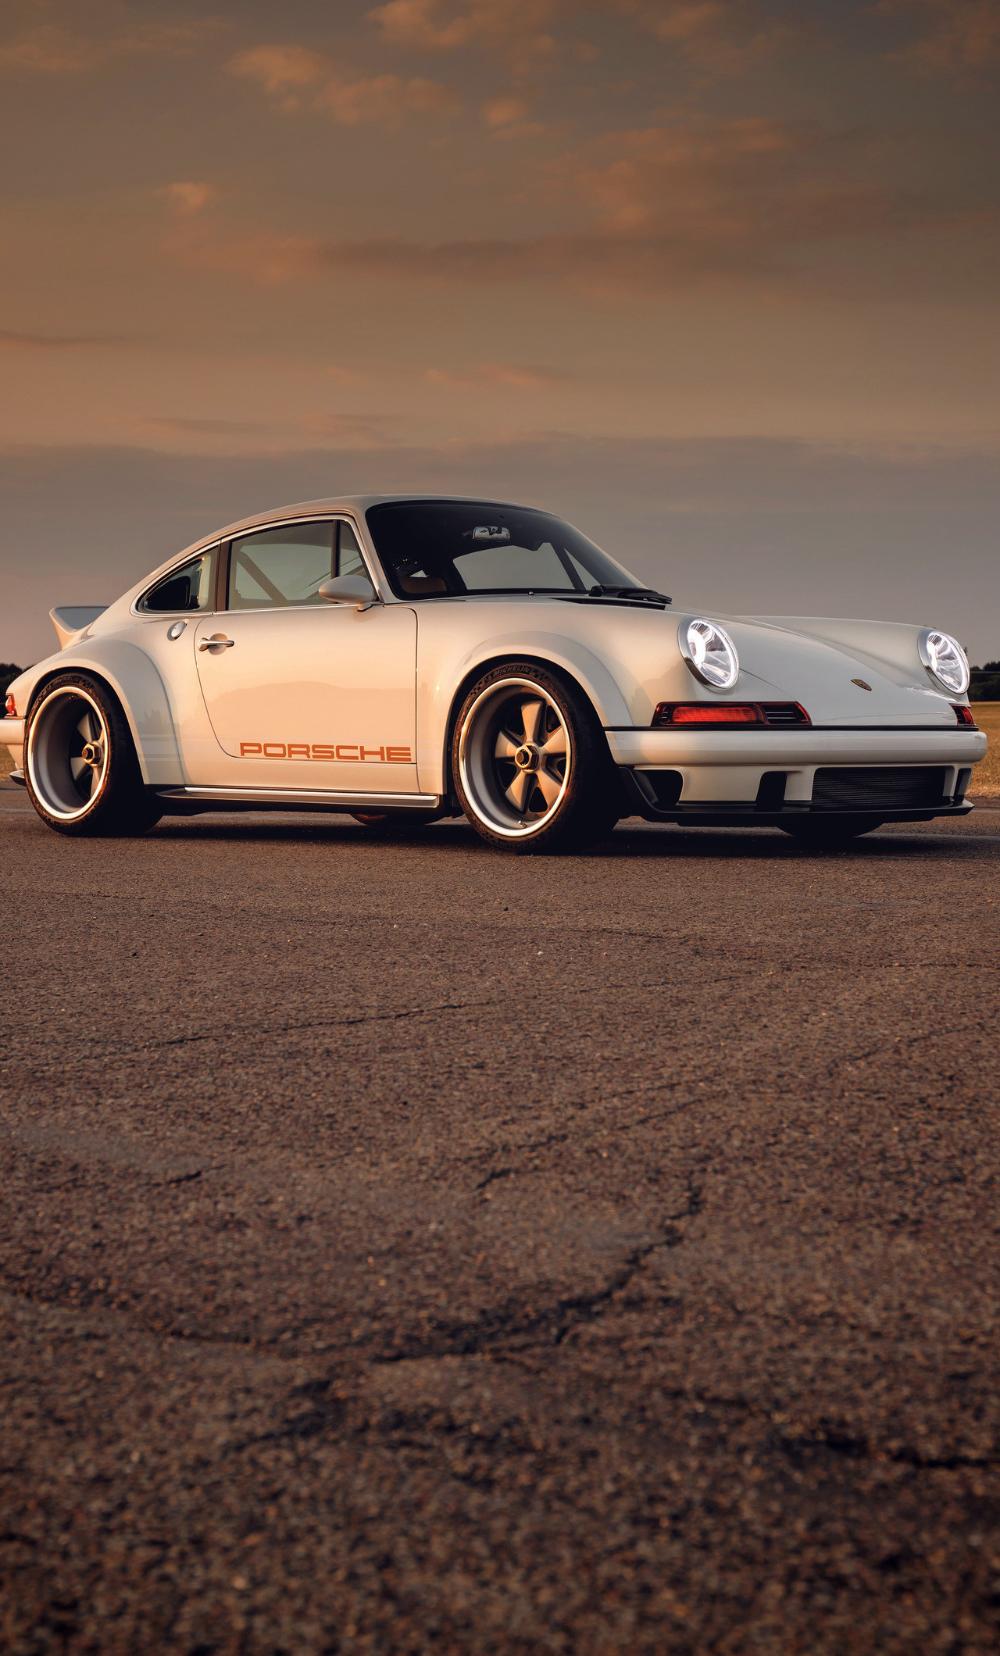 Singer Porsche Wallpaper 70 Images In 2020 Singer Porsche Porsche 911 Porsche